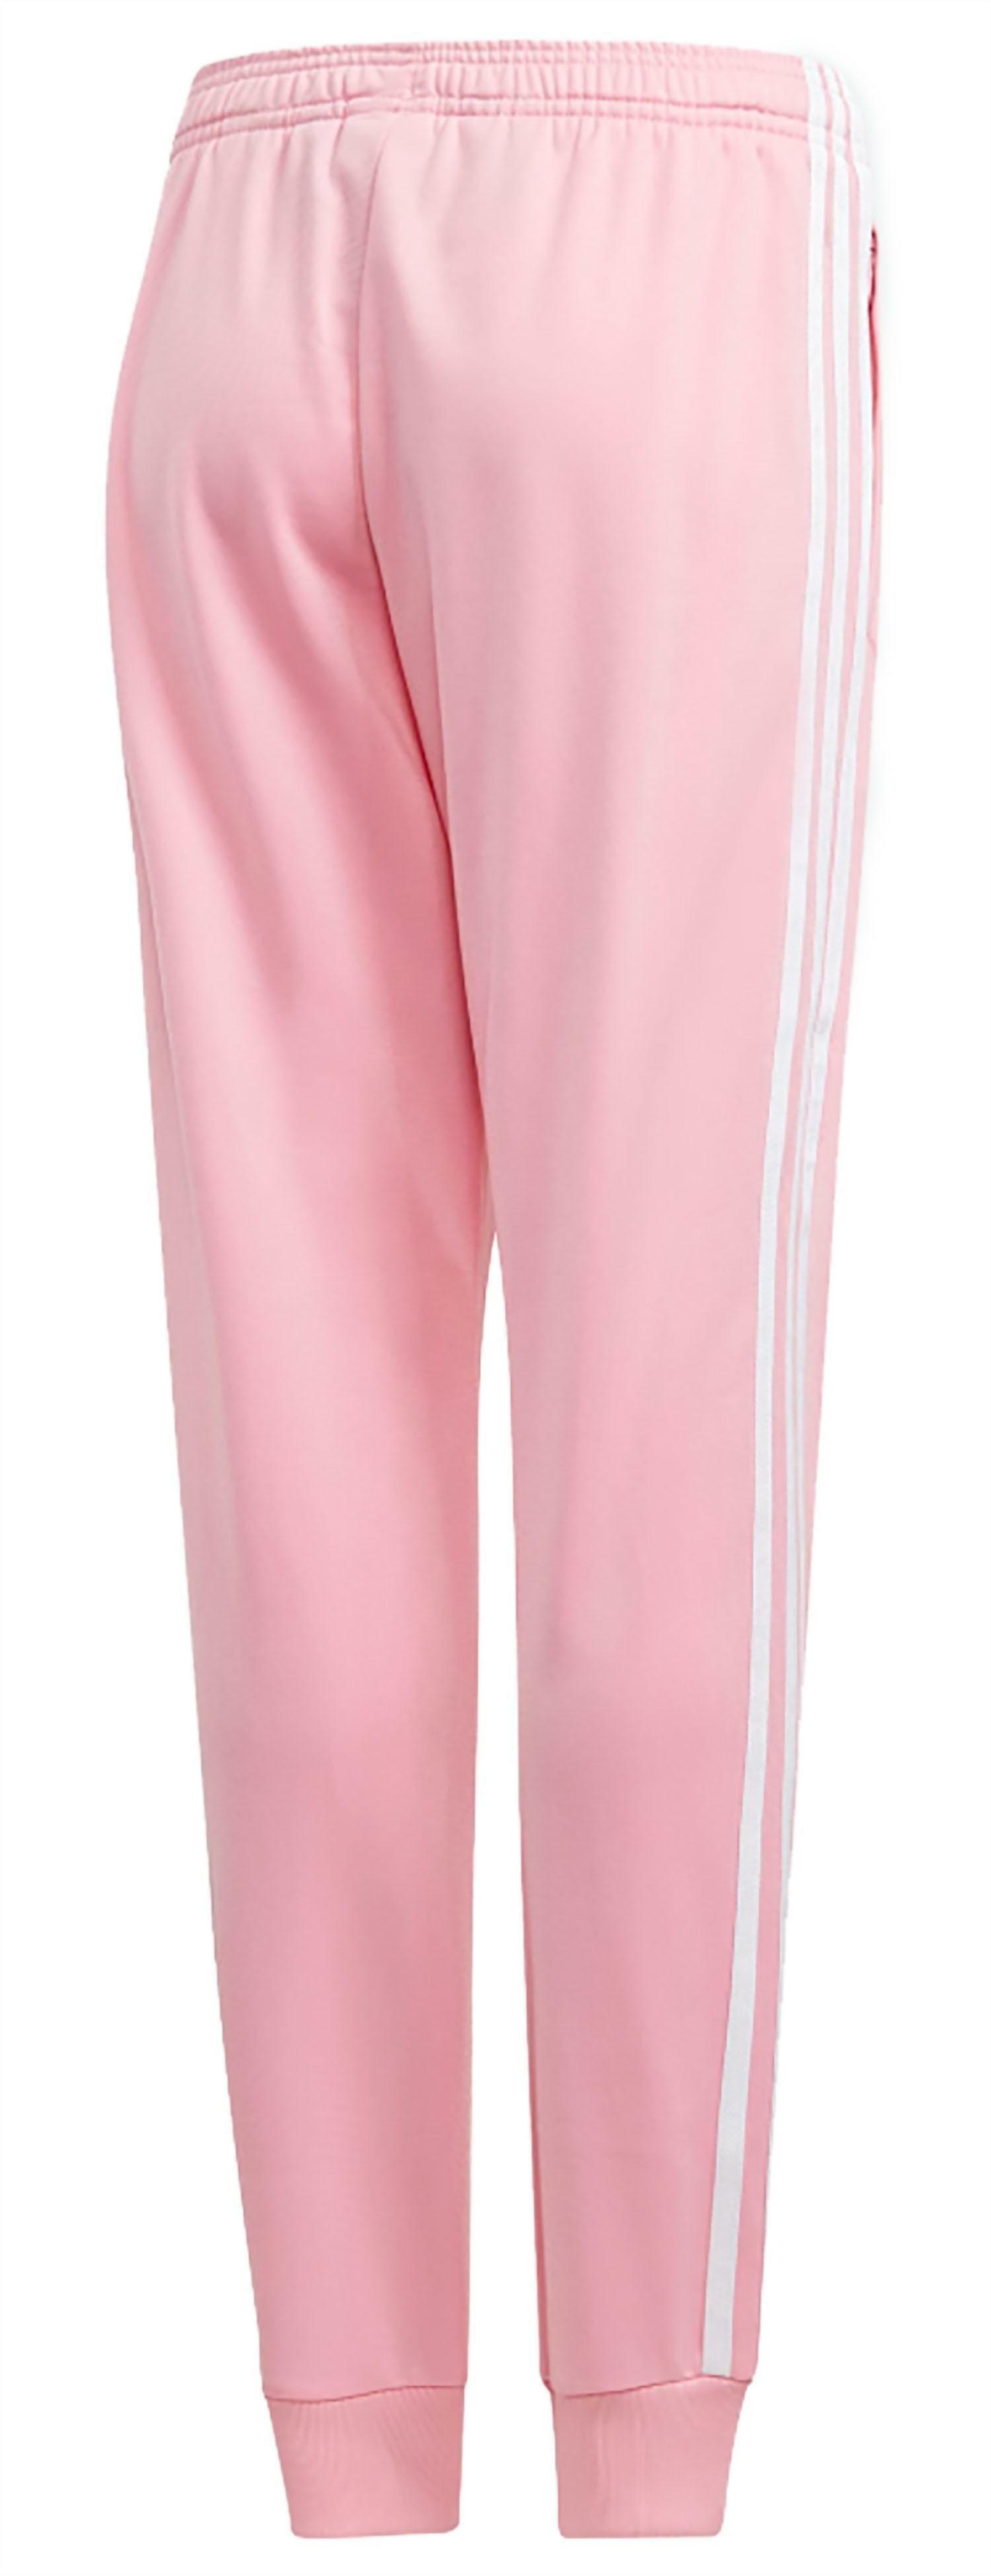 pantaloni tuta bambina adidas